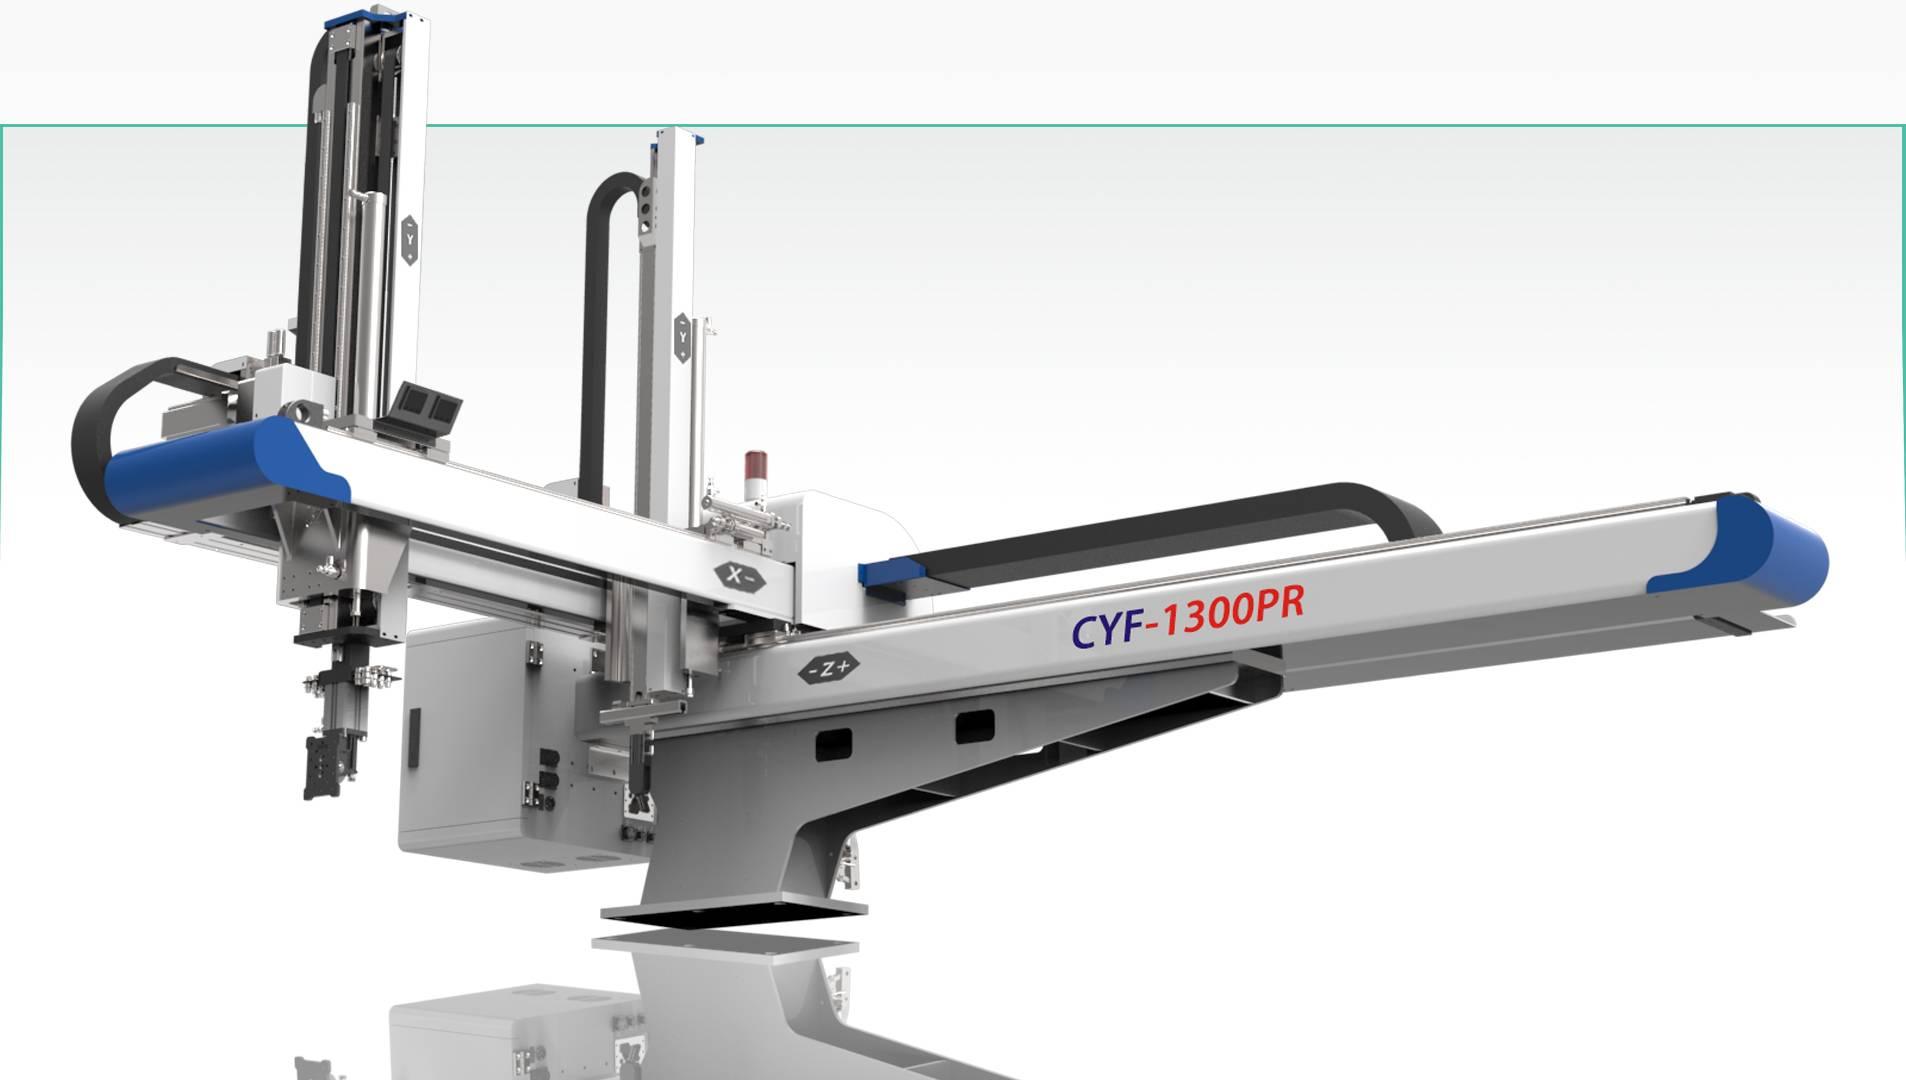 3 axis servo driven robot arm kit - Foshan Chuanyi Precision ...